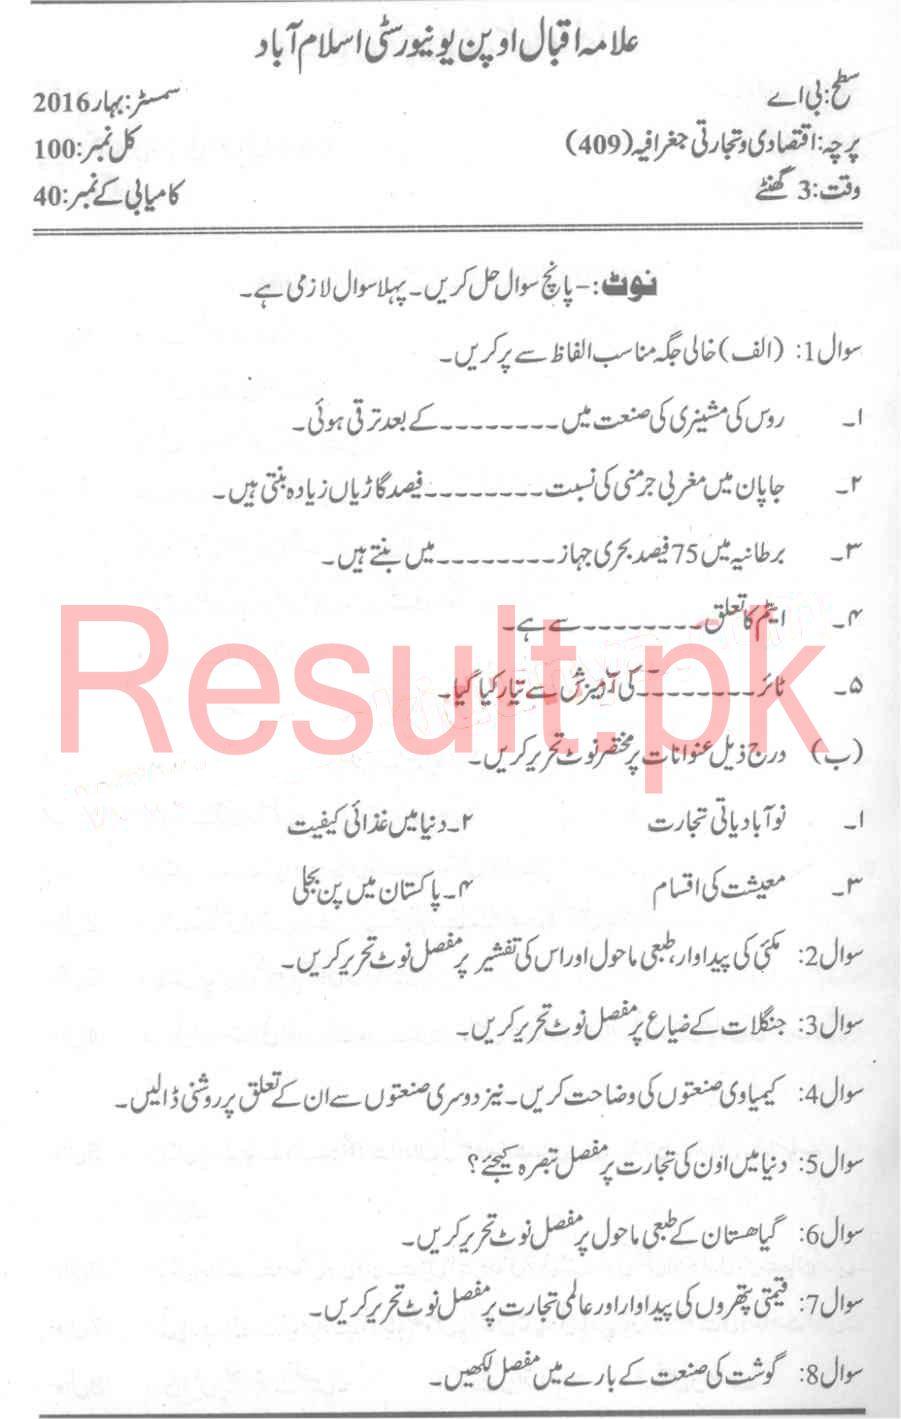 Allama Iqbal Open University Past Papers 2018, aiou Past